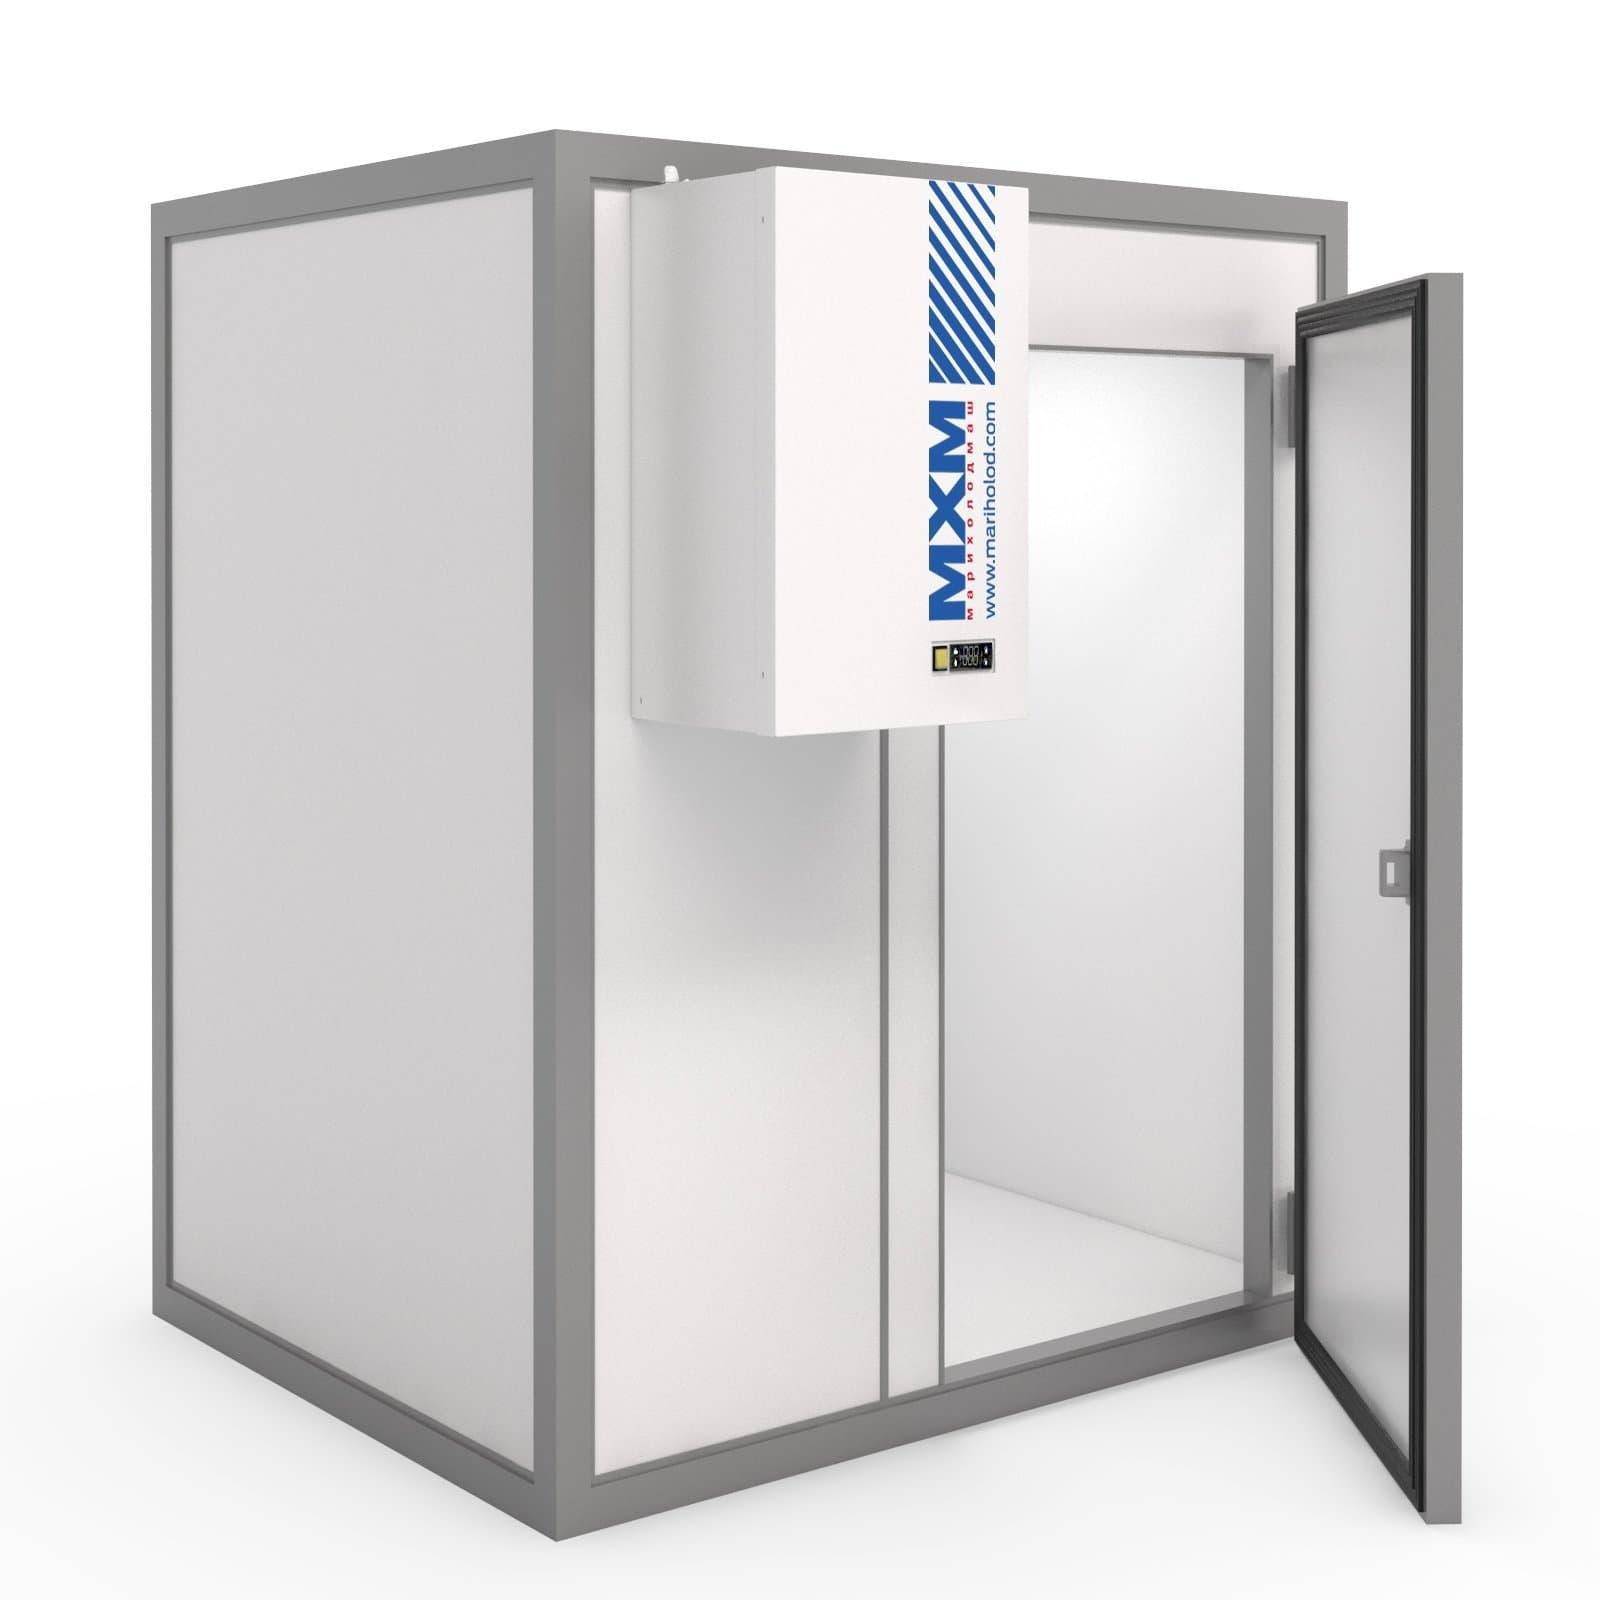 Камера холодильная КХН-108,75 (2560×17860×2720 мм)